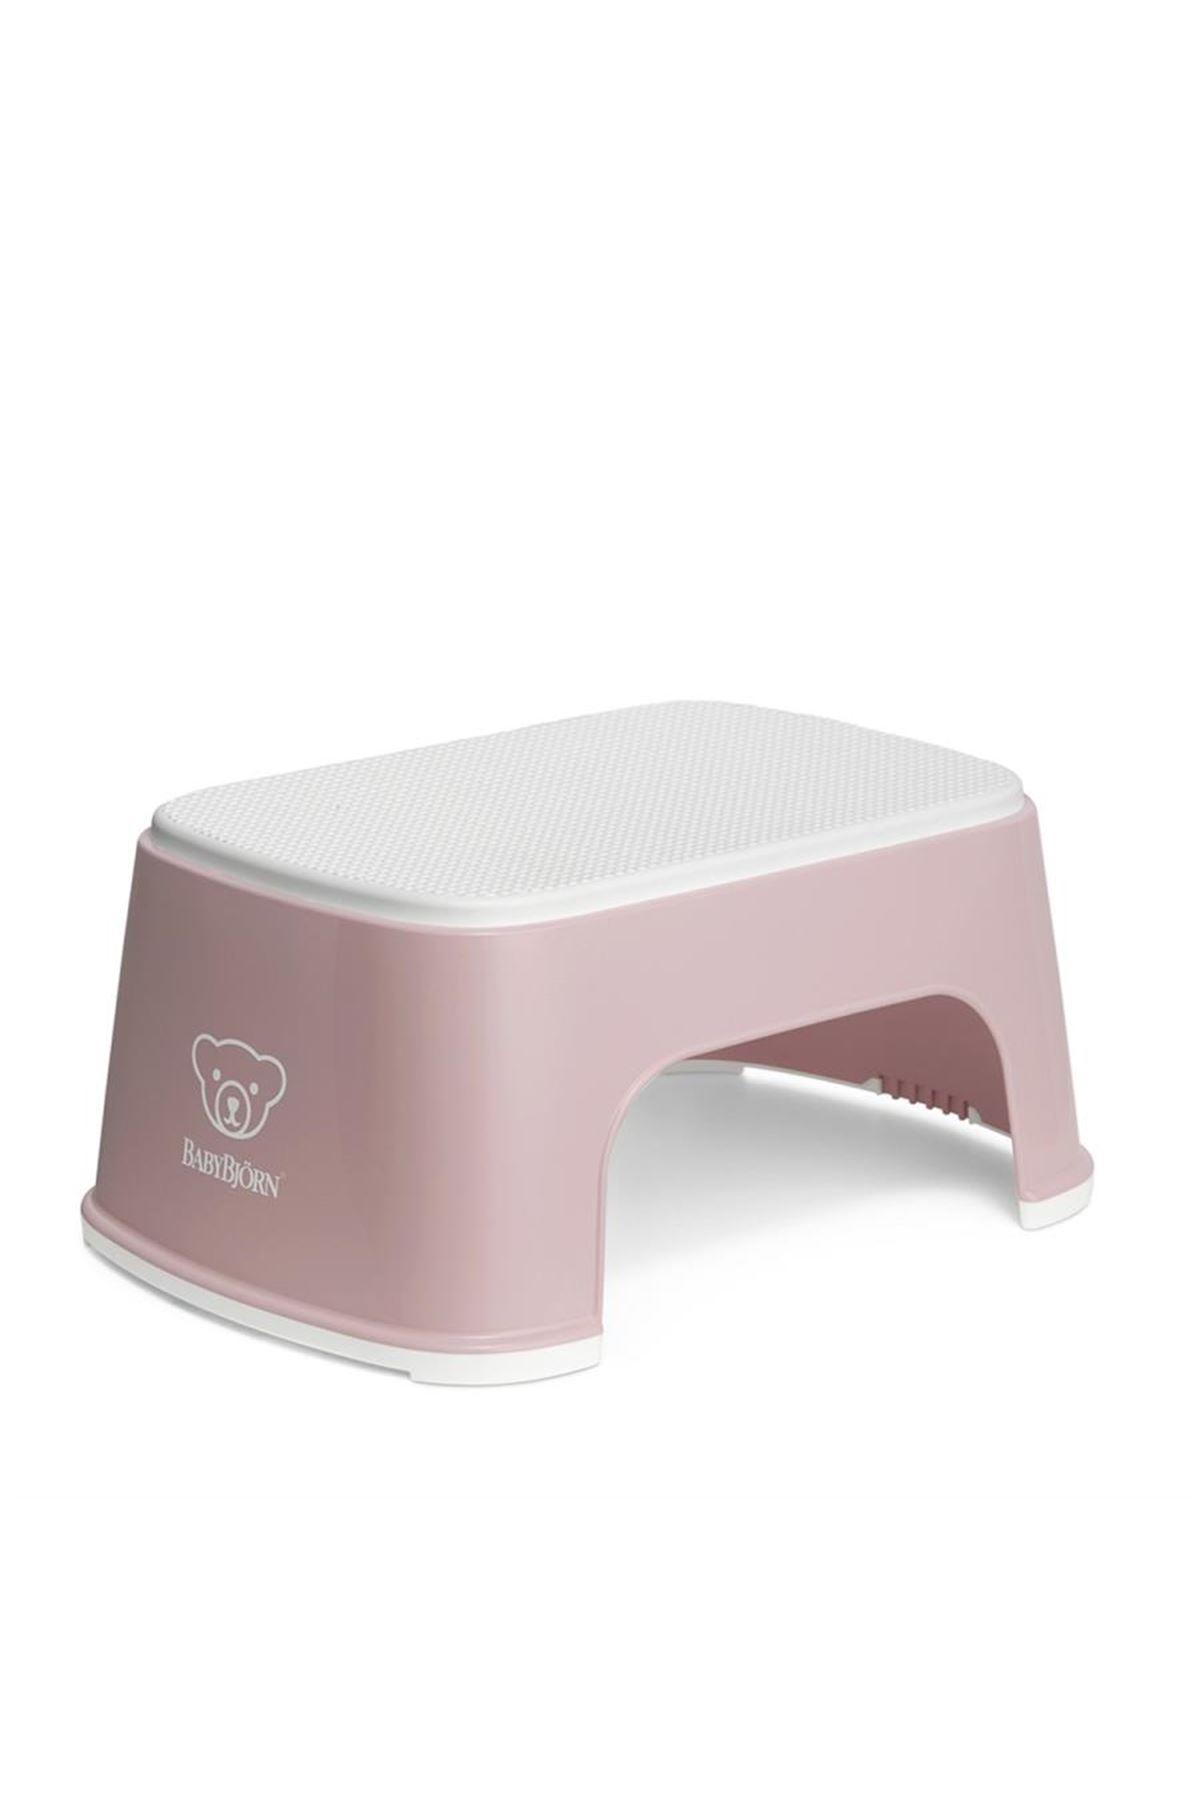 BabyBjörn Safe Step Banyo Basamağı / Powder Pink